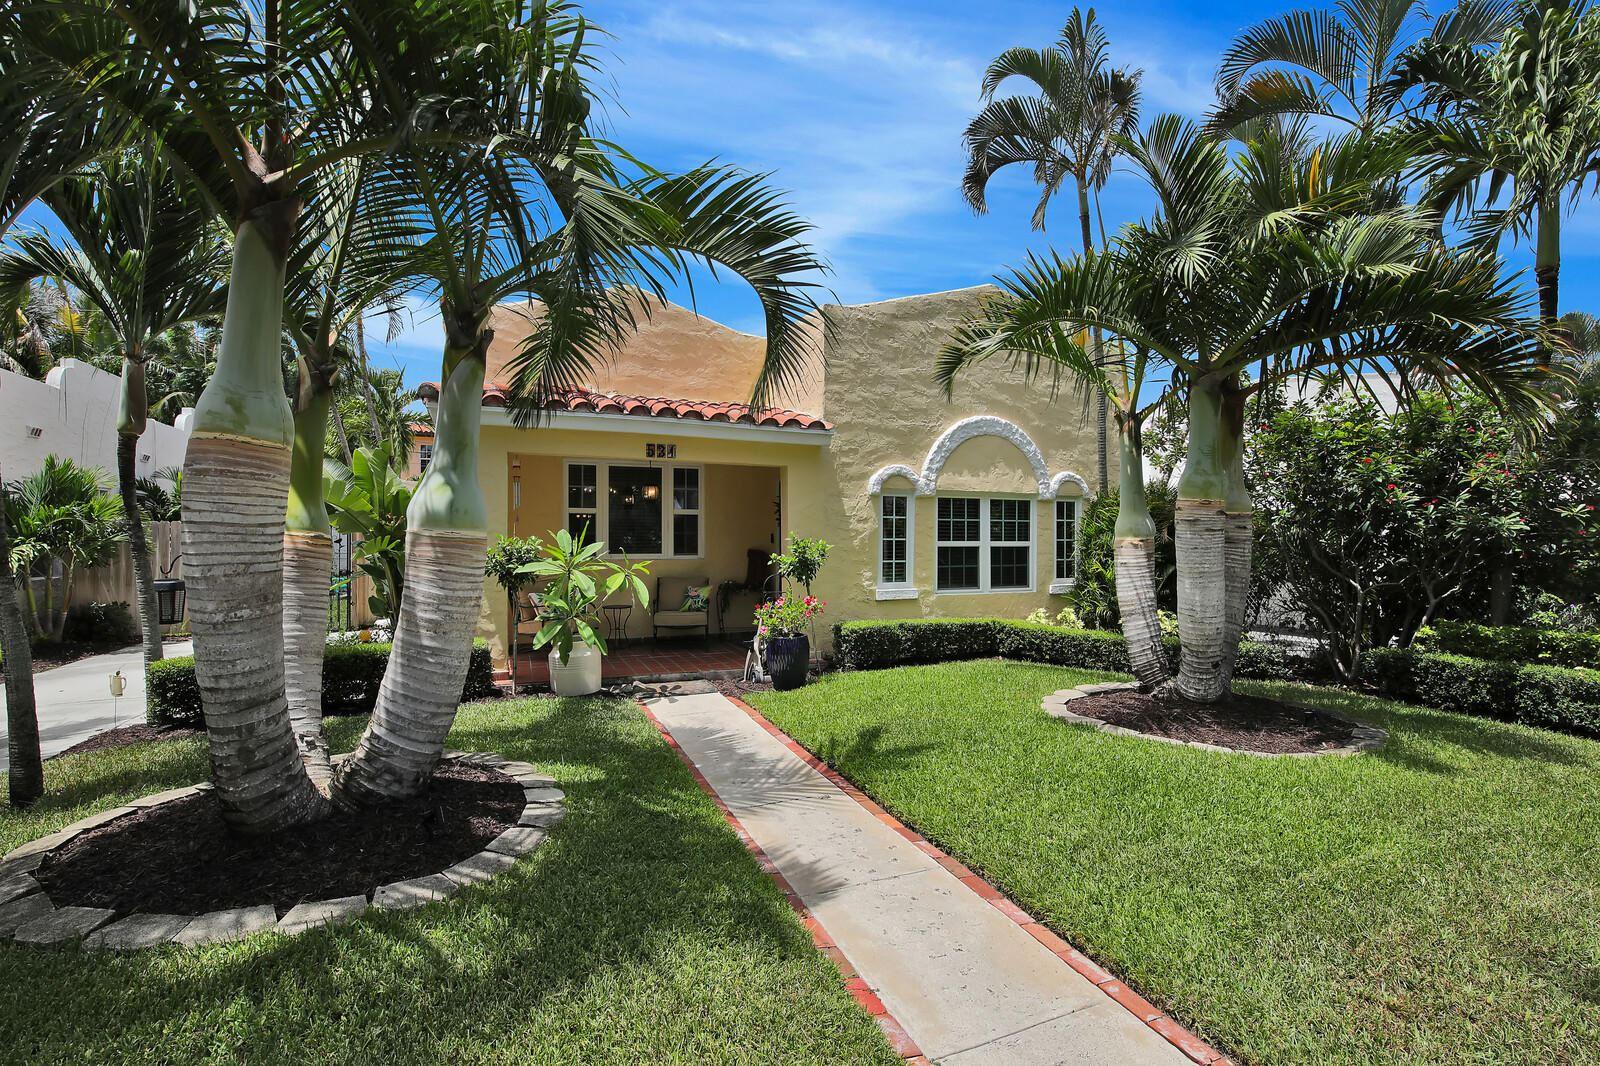 531 Avon Road, West Palm Beach, FL 33401 - #: RX-10635477